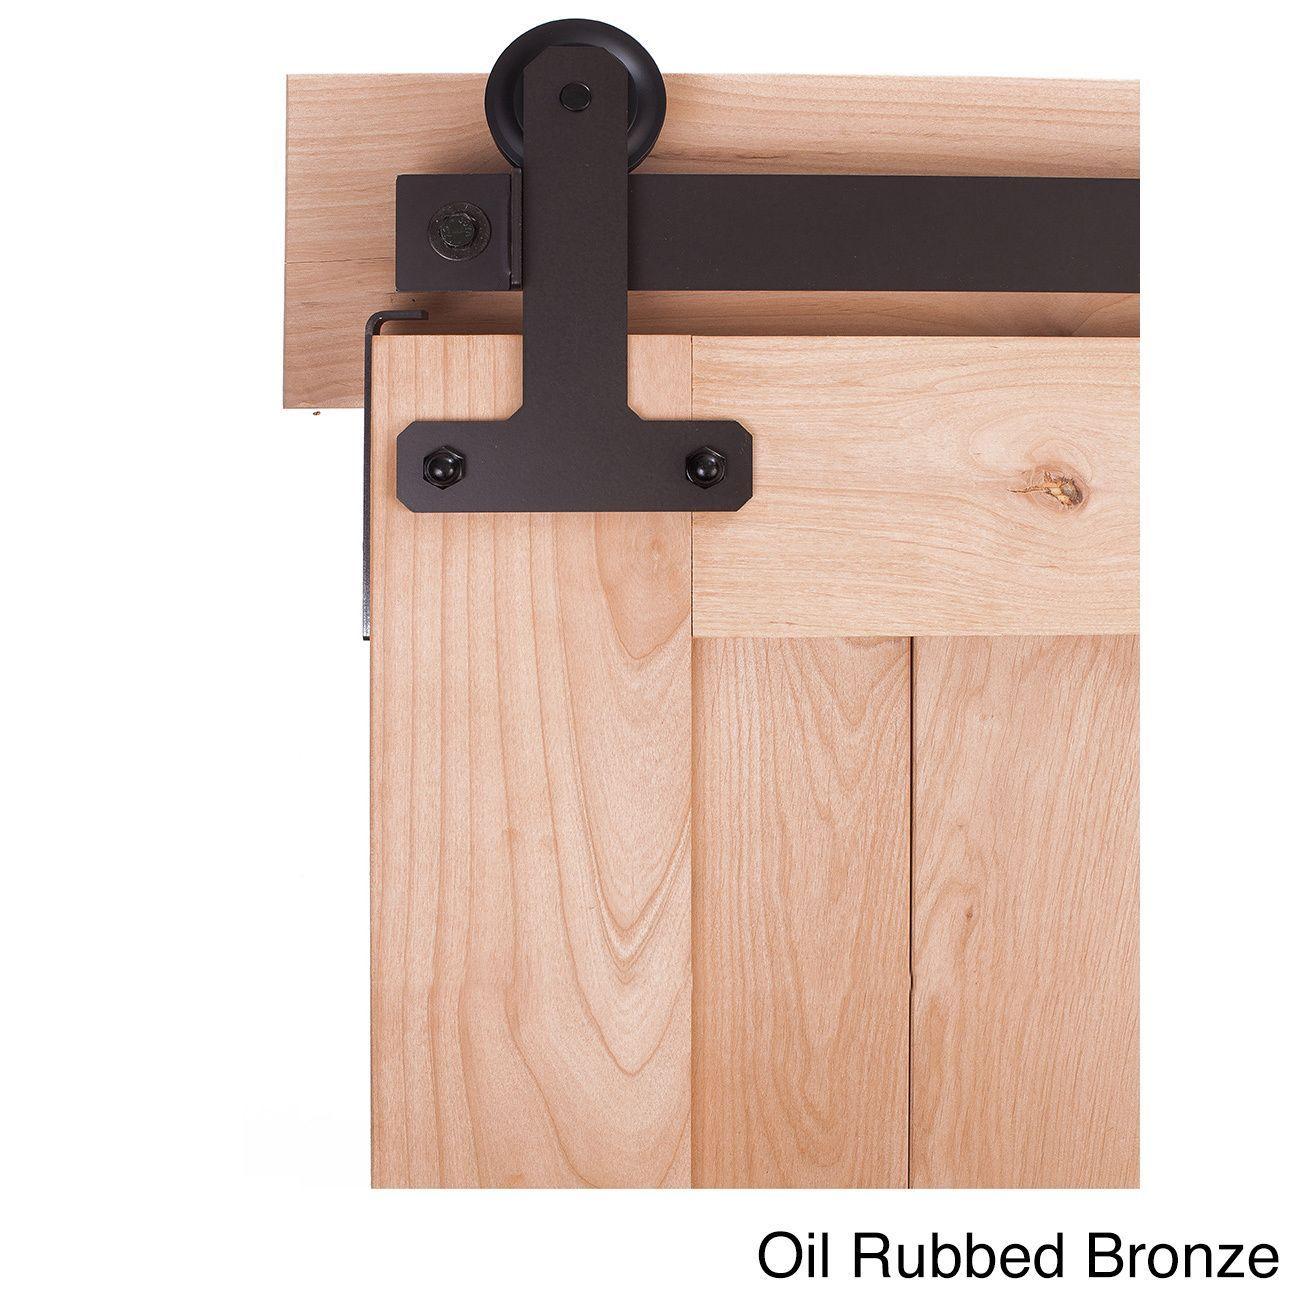 Ironwood Black/Bronze/Silver Metal Cellar-style Barn Door Hardware System (6-Foot